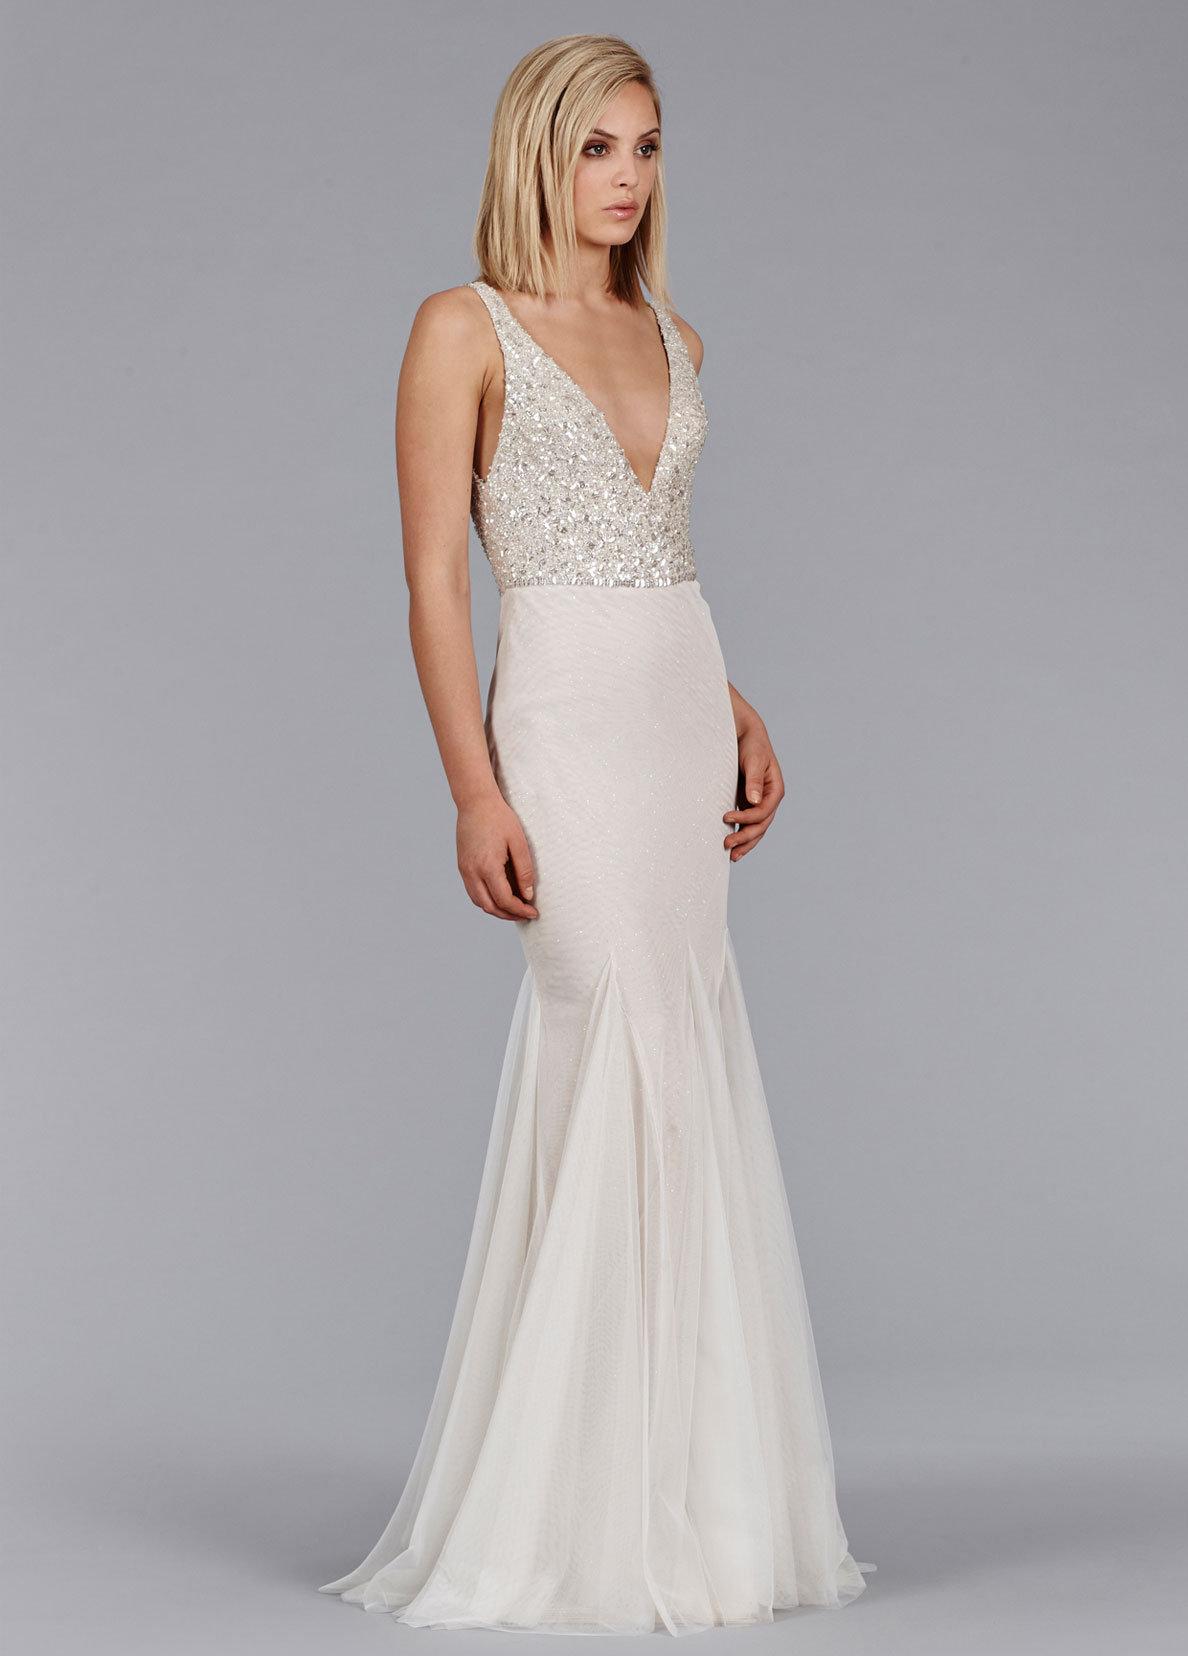 Hjelm wedding dresses sale